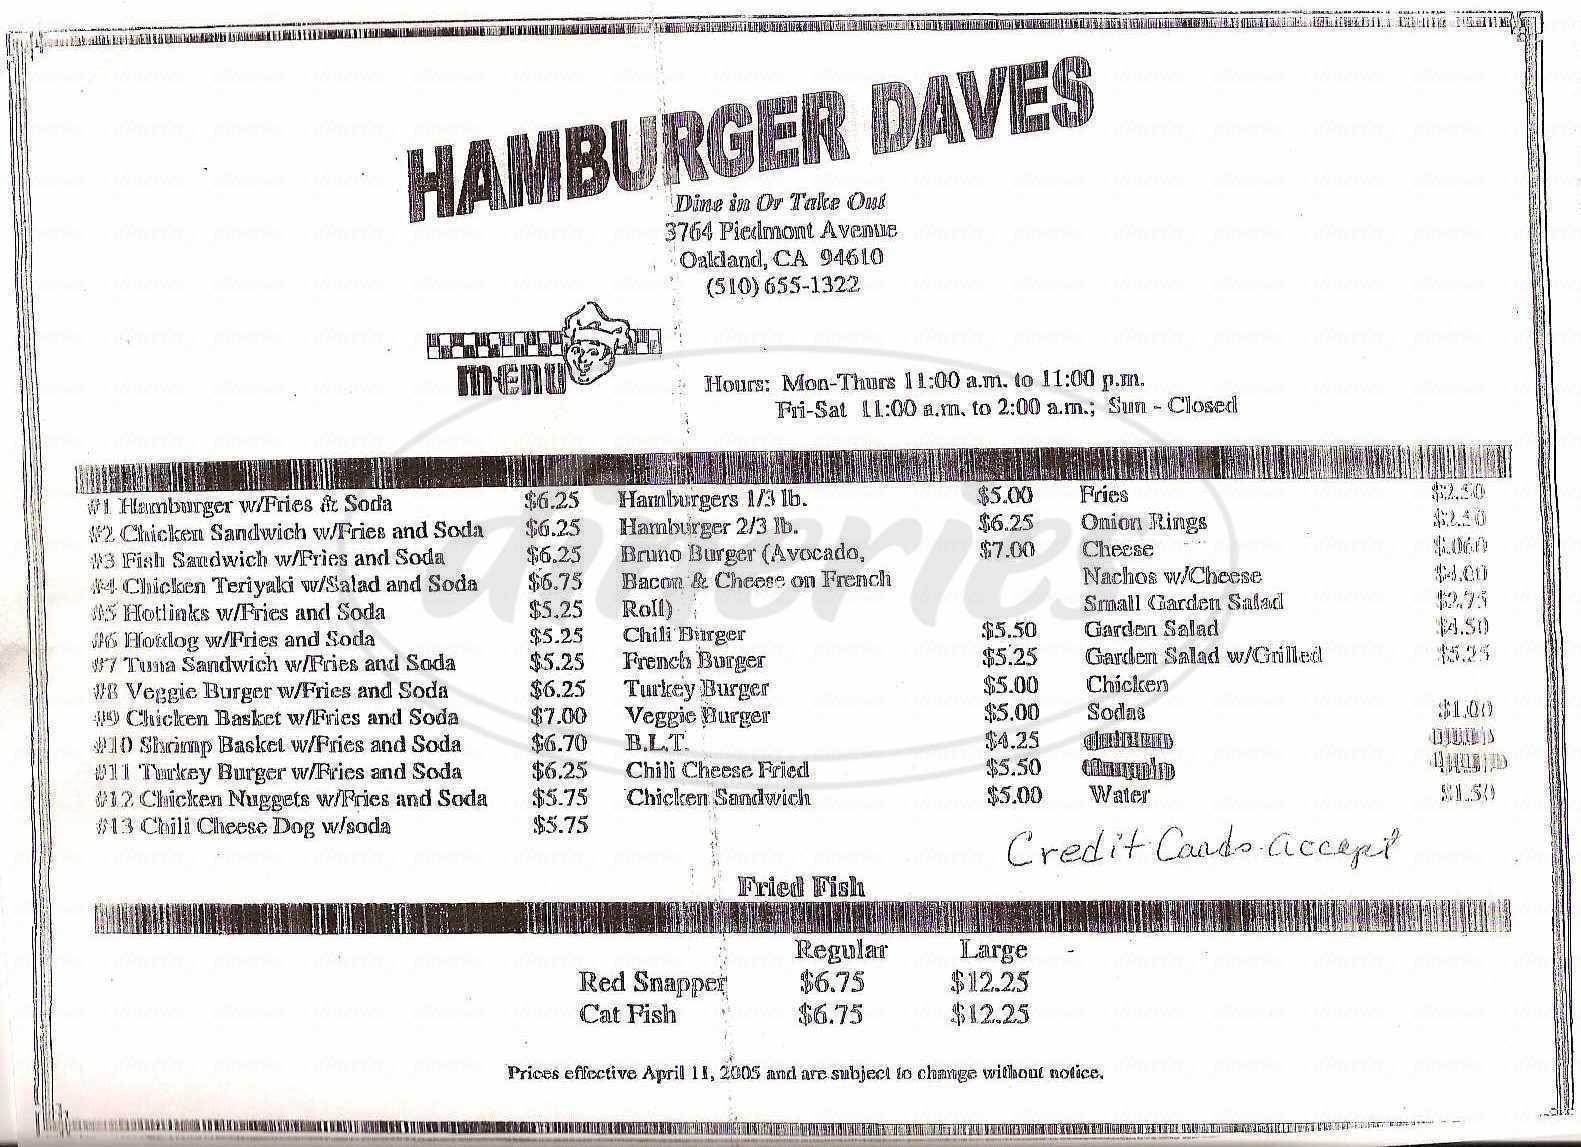 menu for Dave's Hamburgers